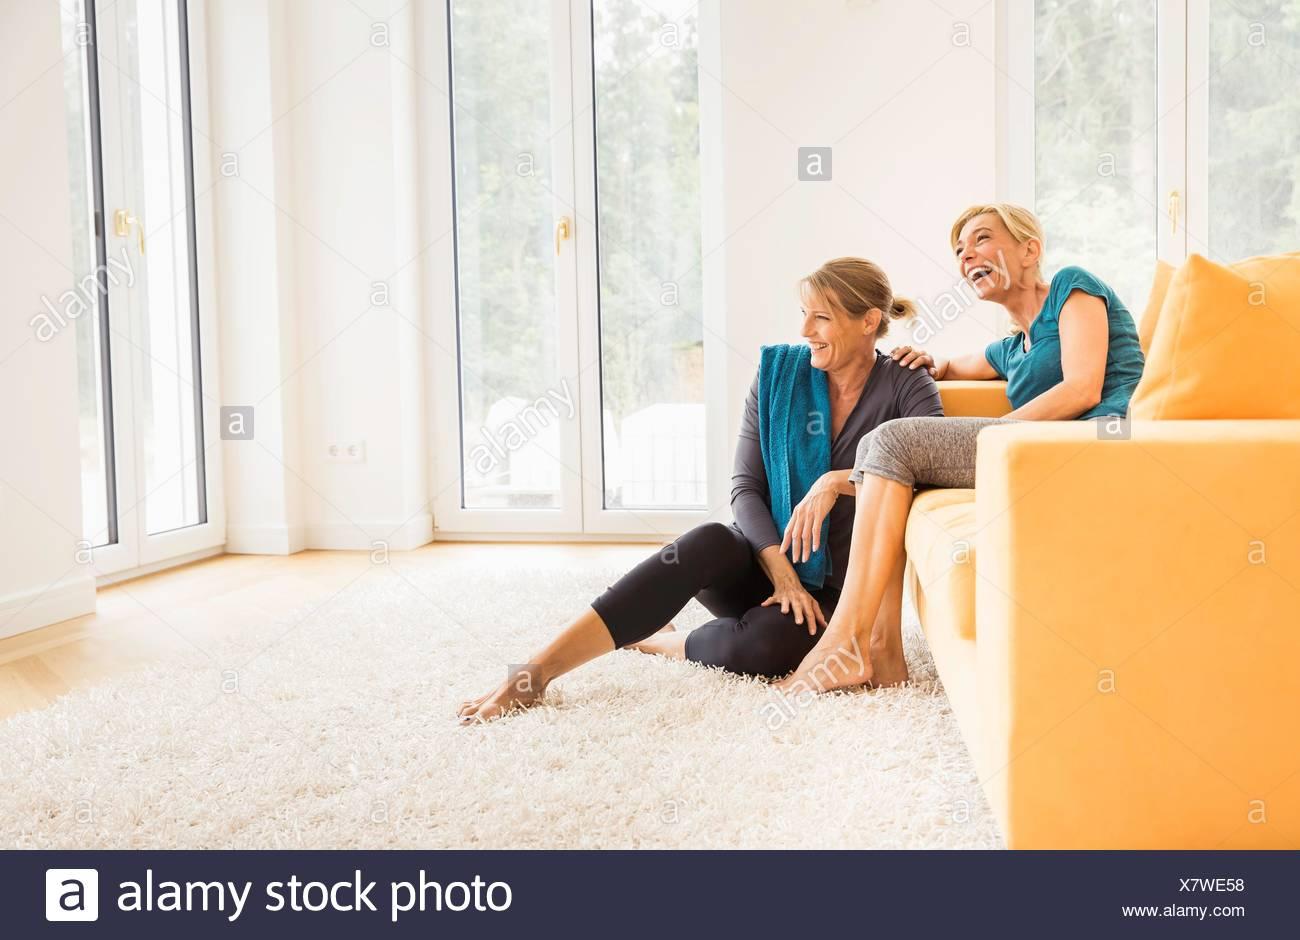 Two mature women taking an exercise break on living room sofa - Stock Image